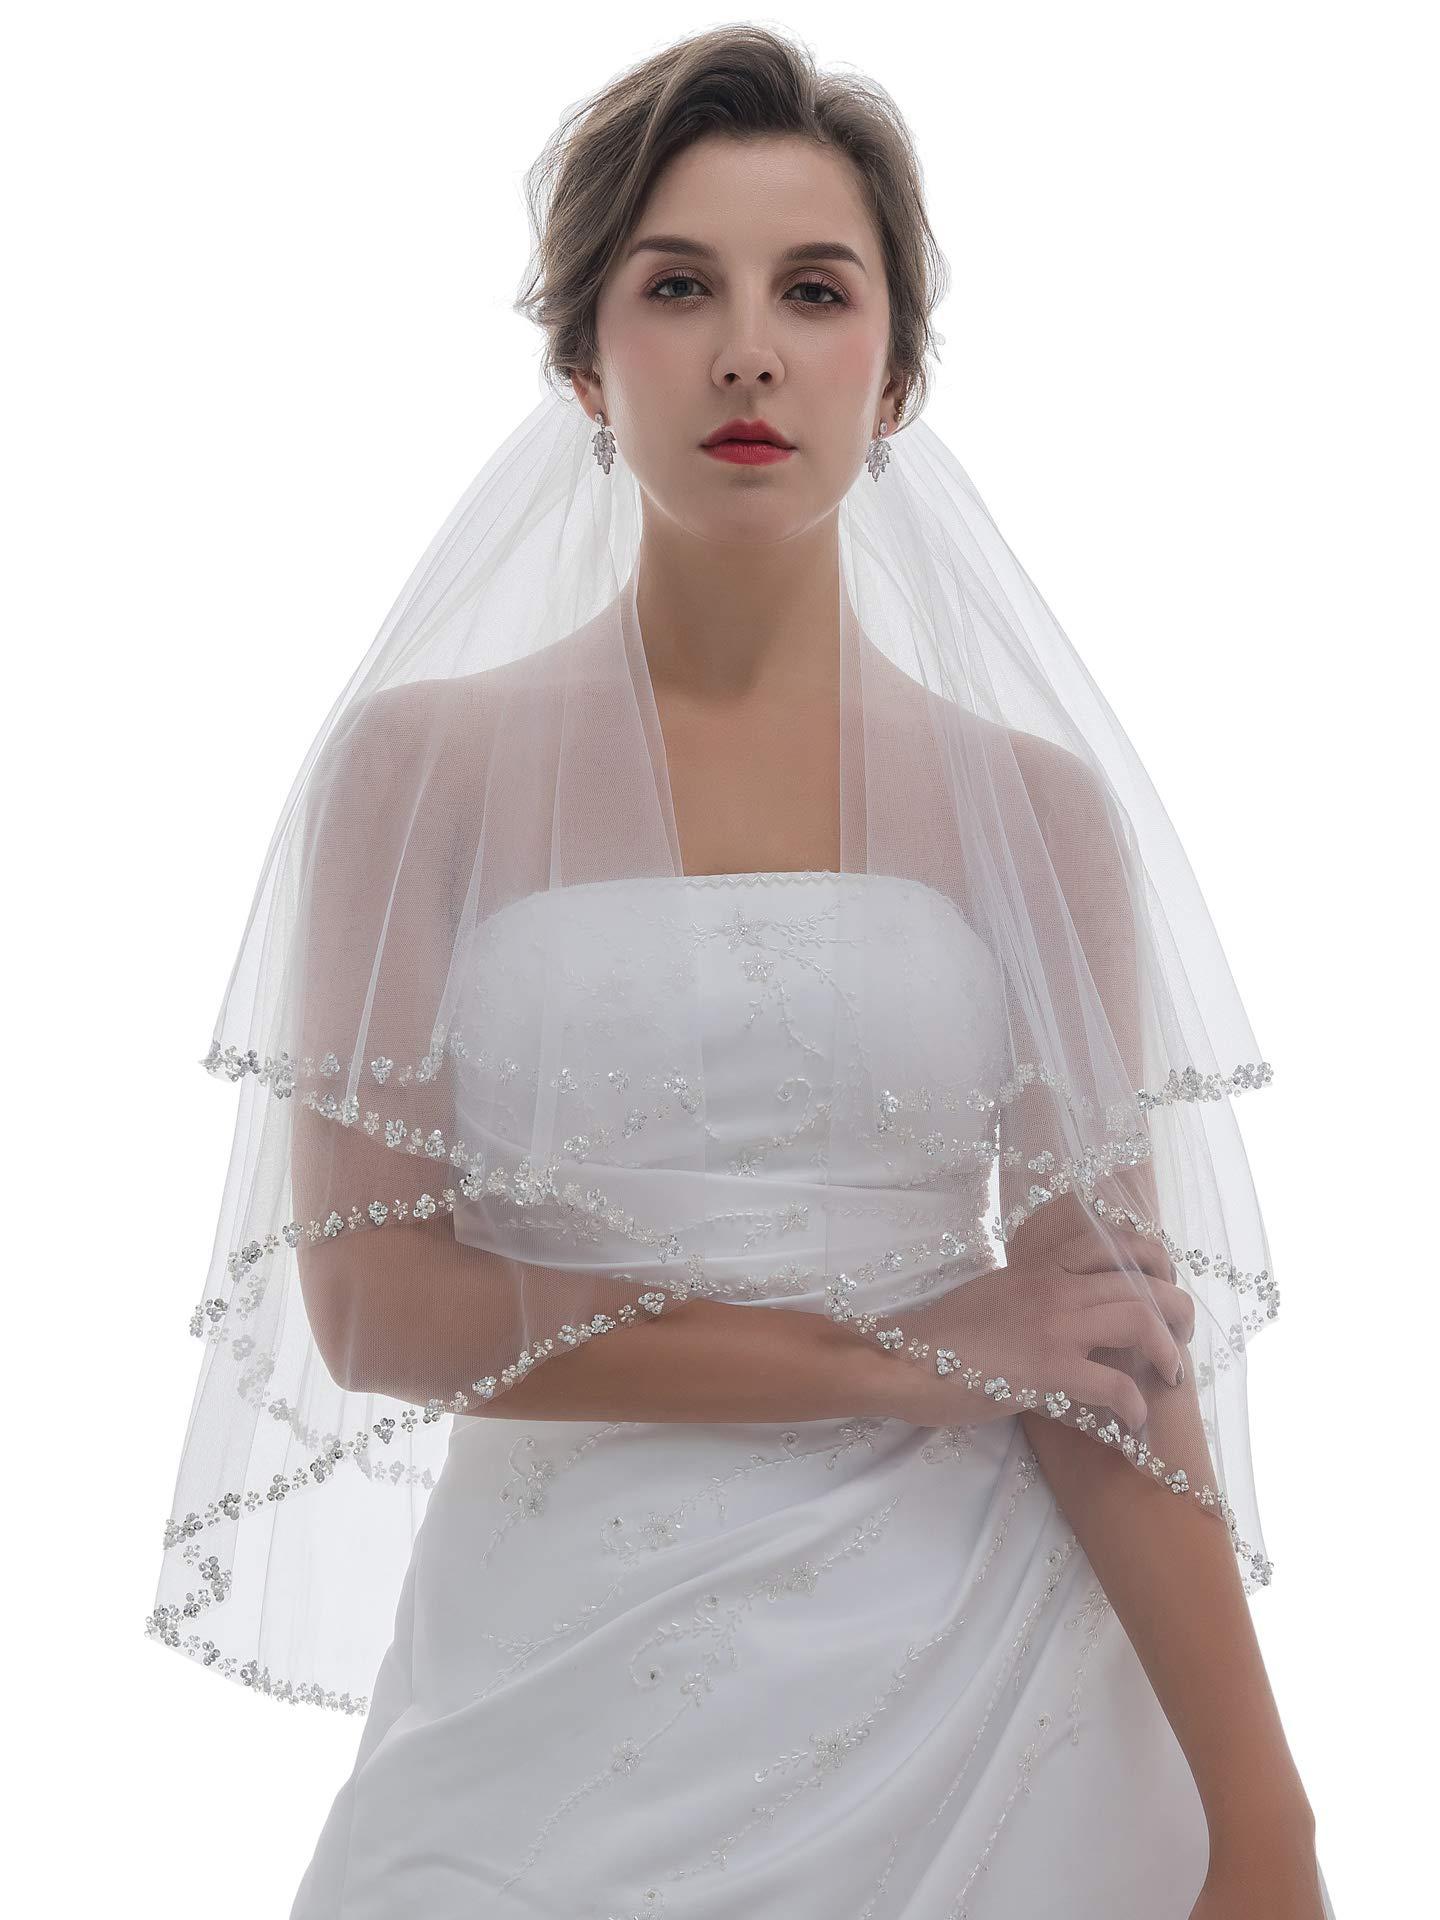 2T 2 Tier Pearls Silver Beaded Wedding Veil - Ivory Elbow Length 30'' V415 by SAMKY